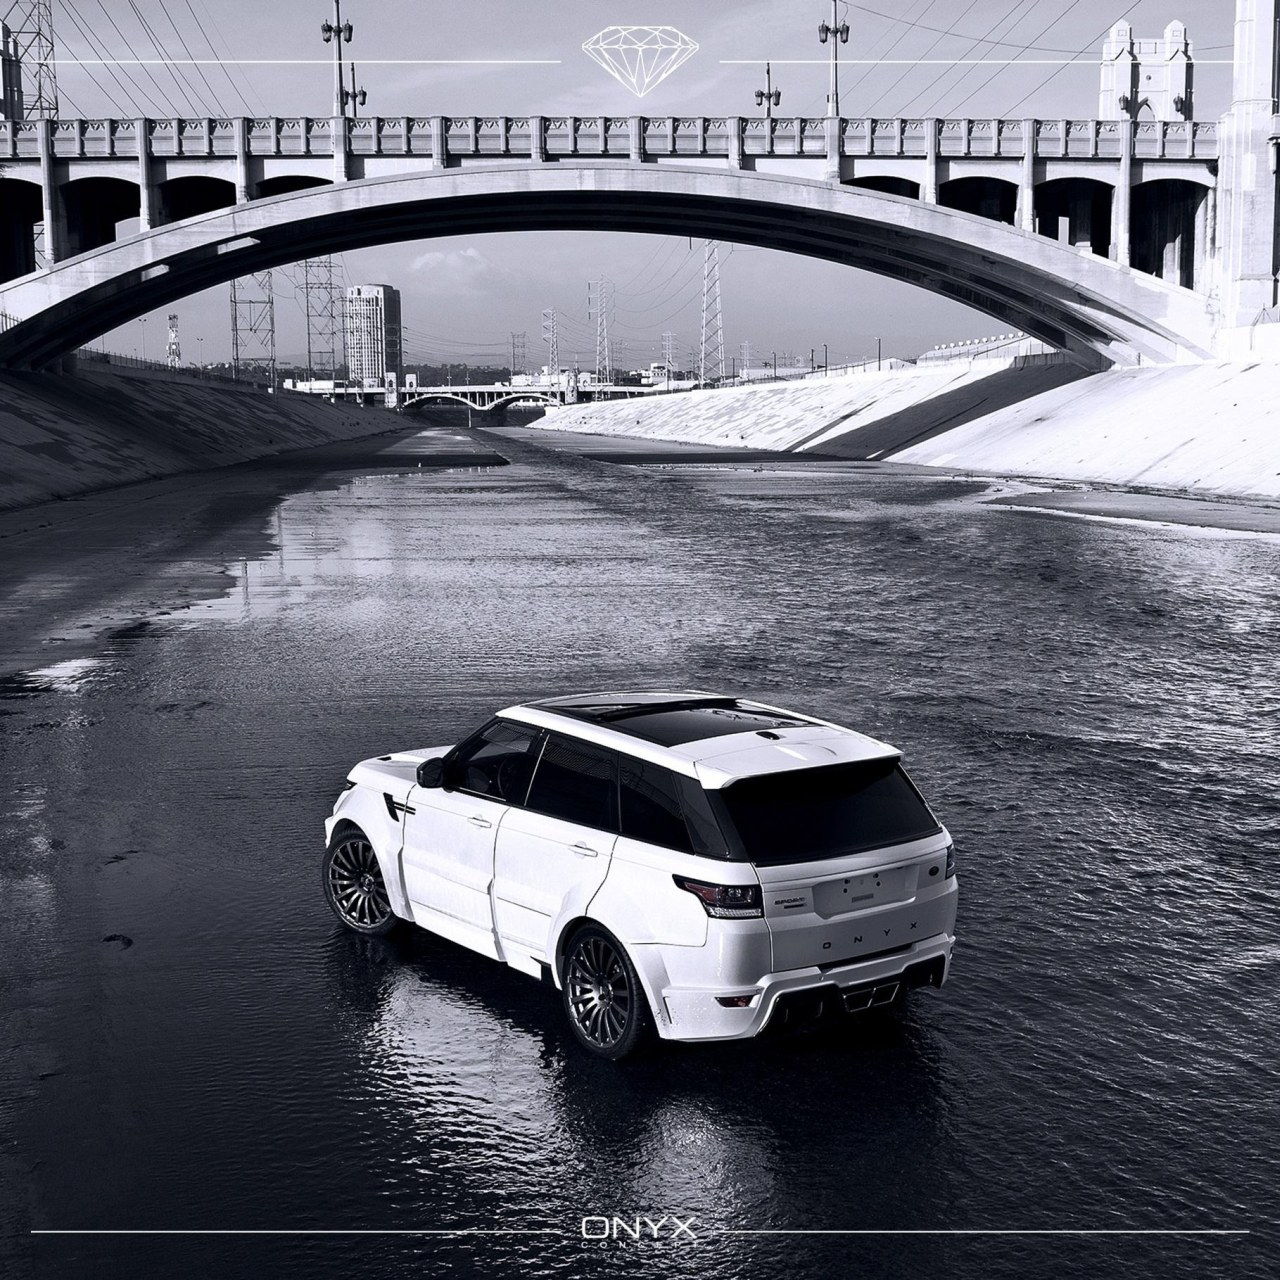 Onyx-RR-Sport-01.jpg